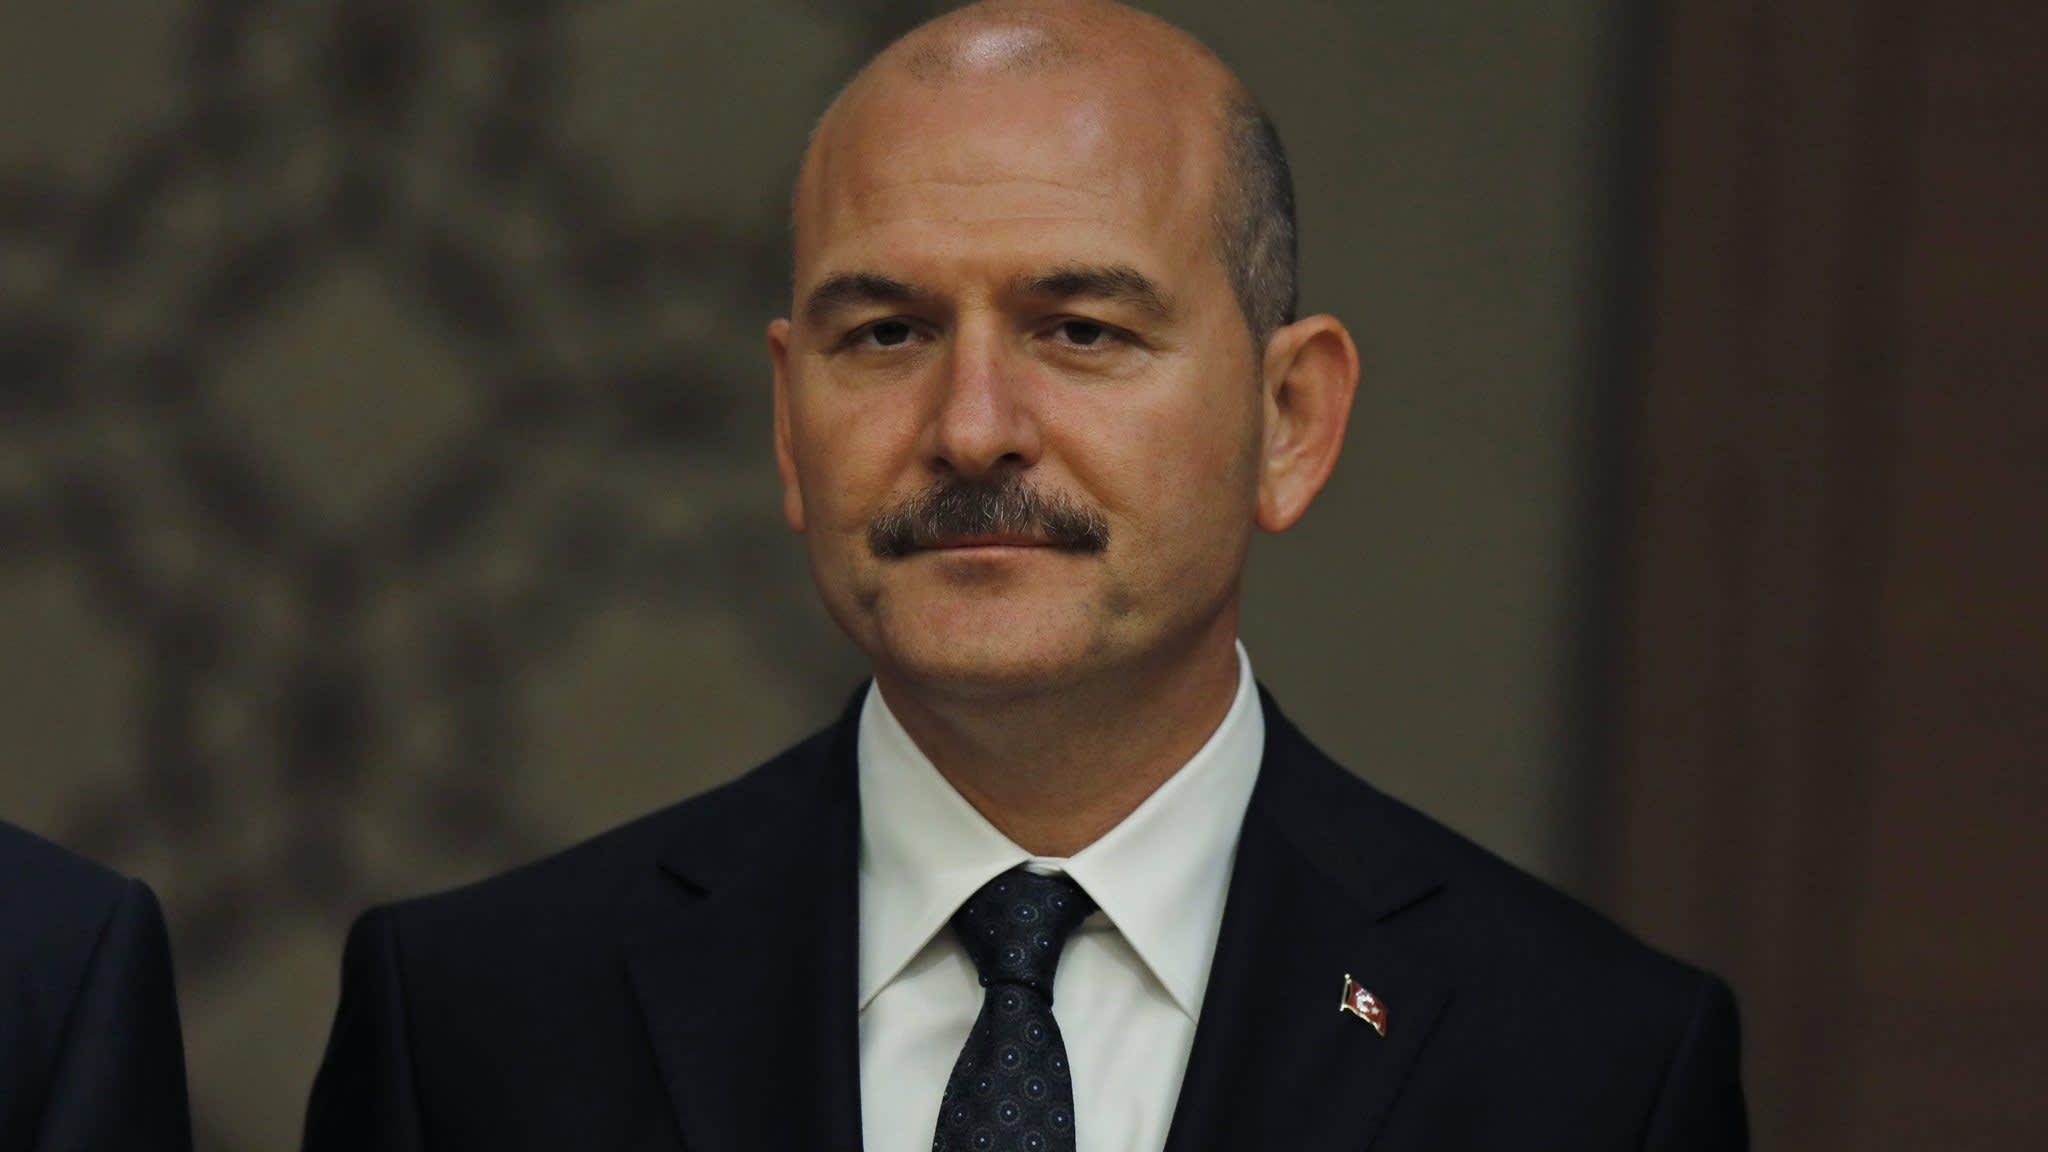 Turkey threatens to retaliate against US over sanctions